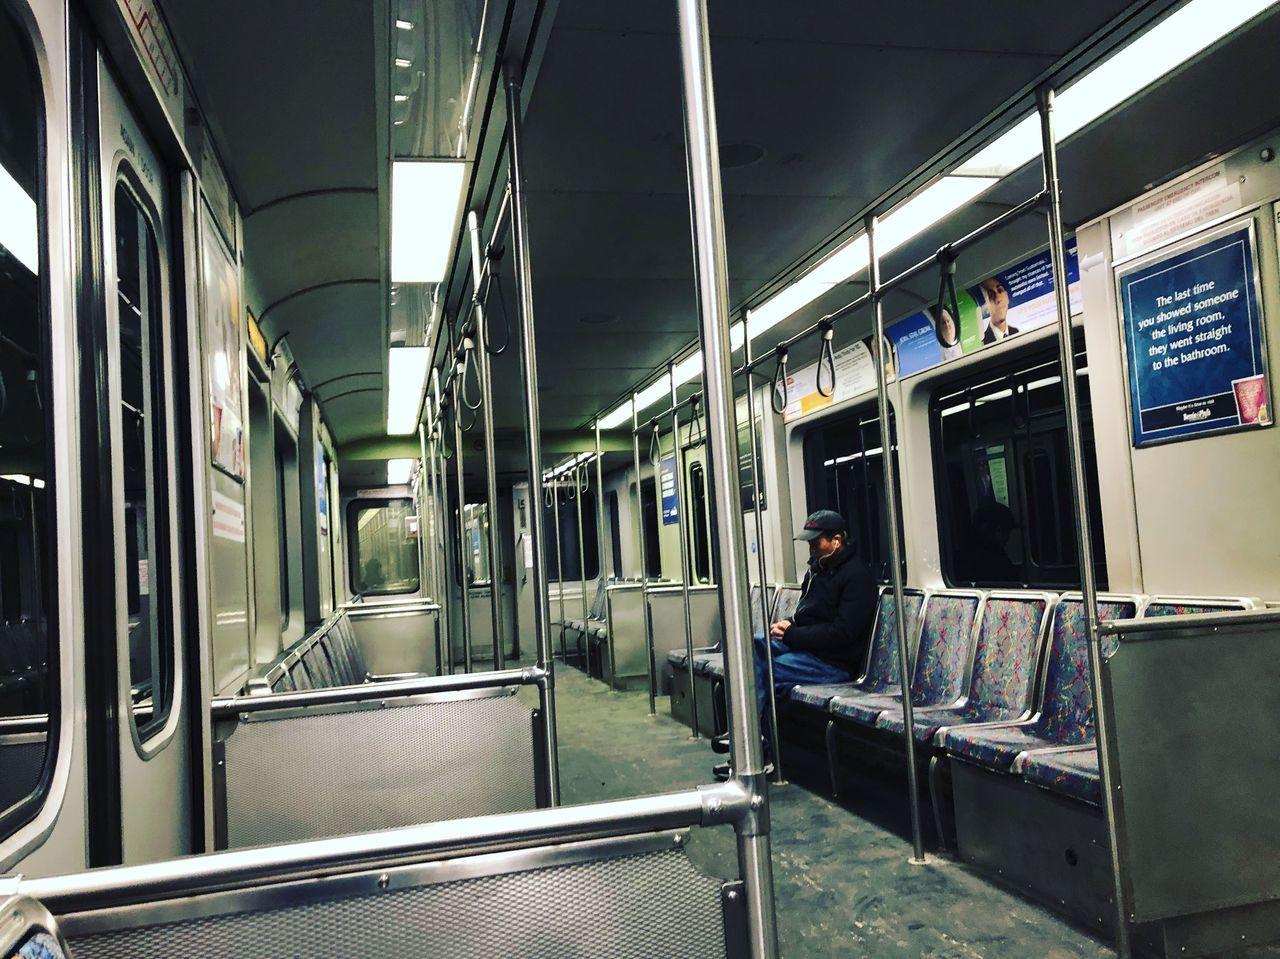 public transportation, transportation, train - vehicle, rail transportation, mode of transport, passenger train, illuminated, vehicle seat, no people, subway train, indoors, day